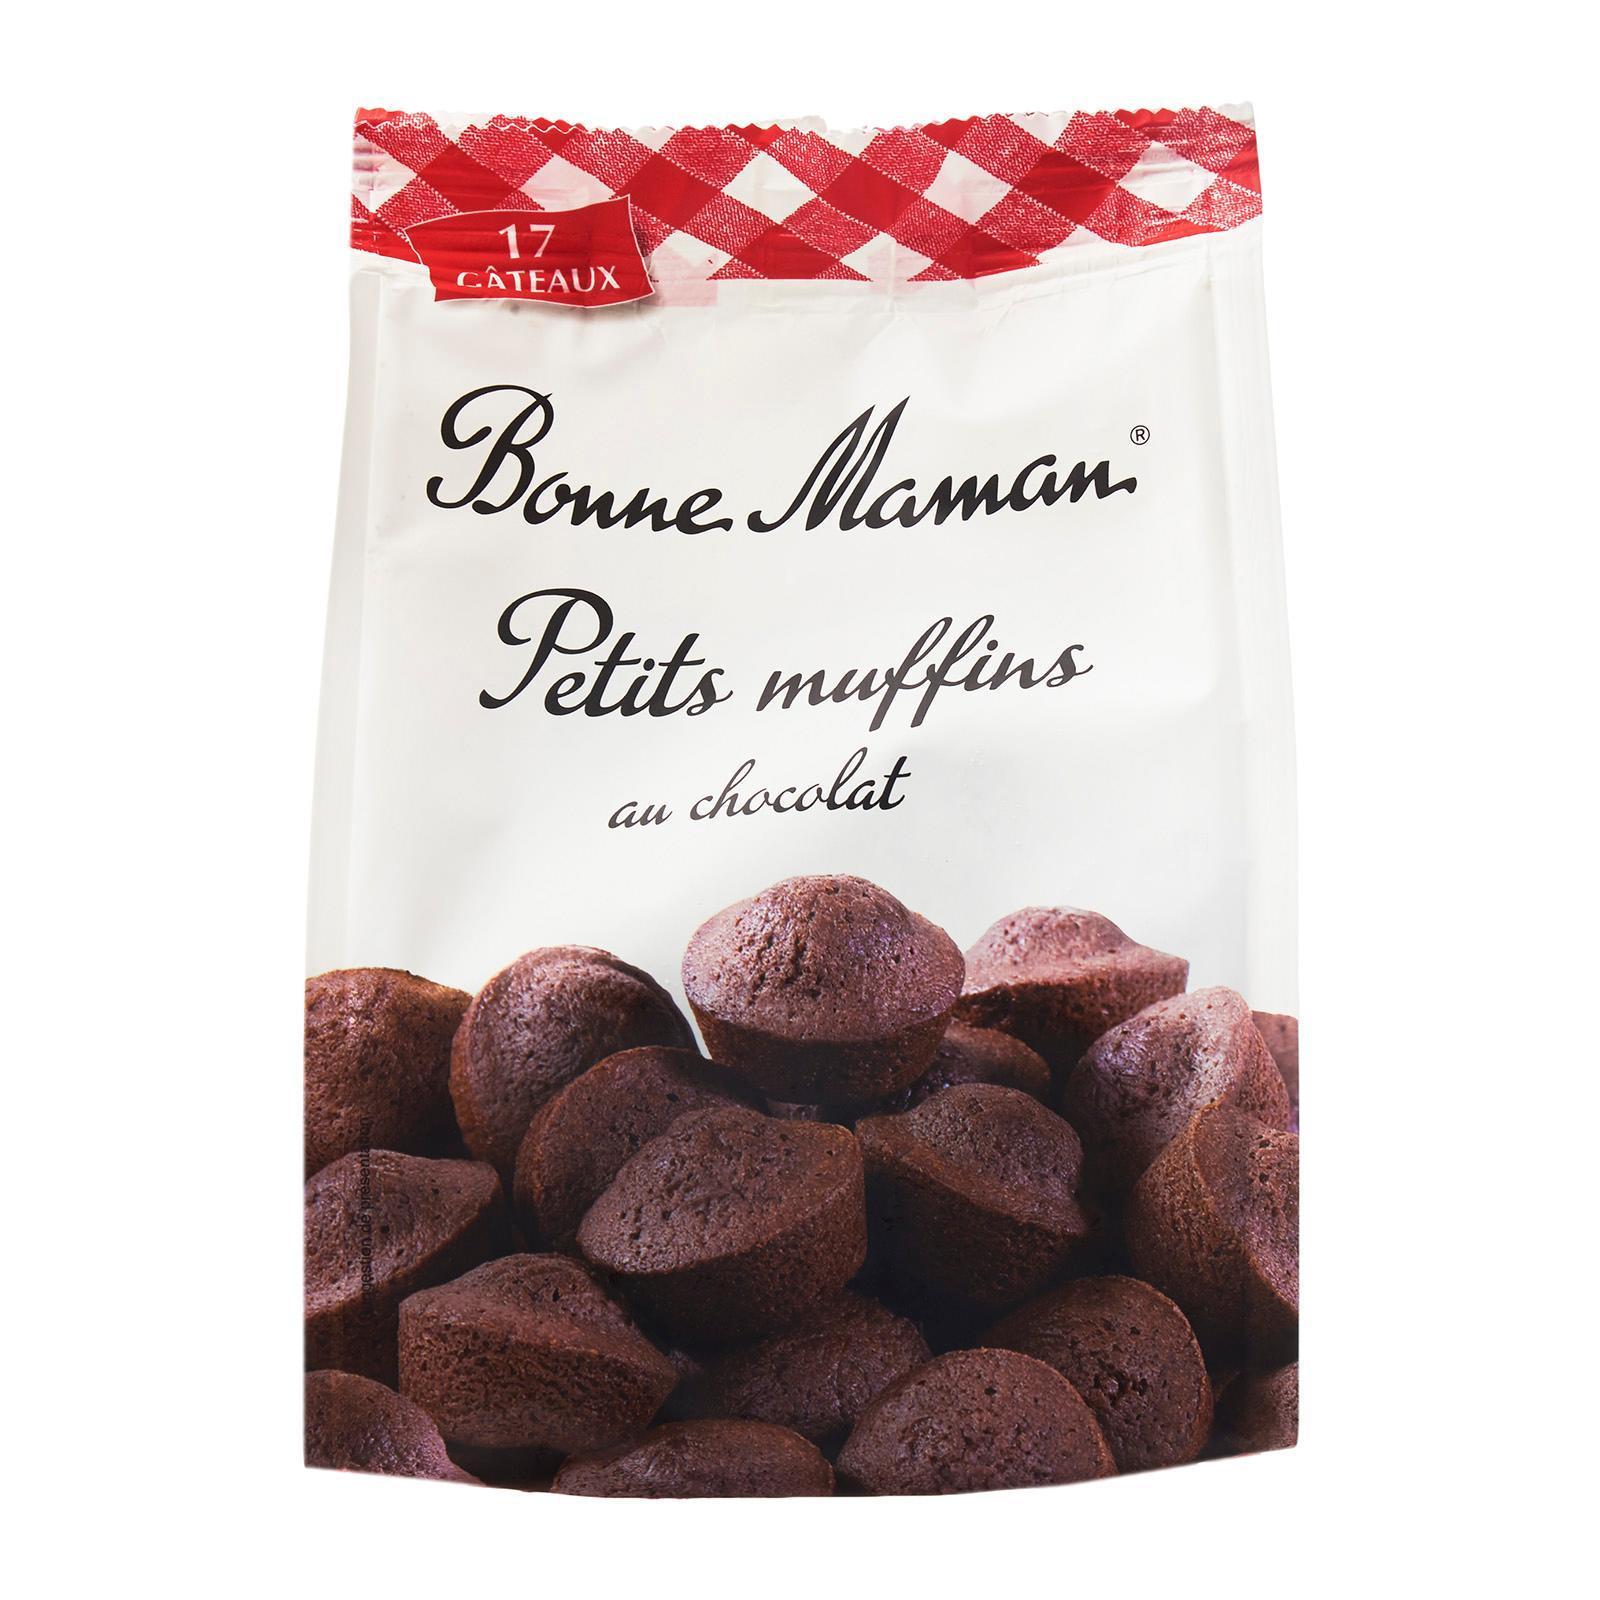 Bonne Maman Chocolate Little Muffins By Redmart.